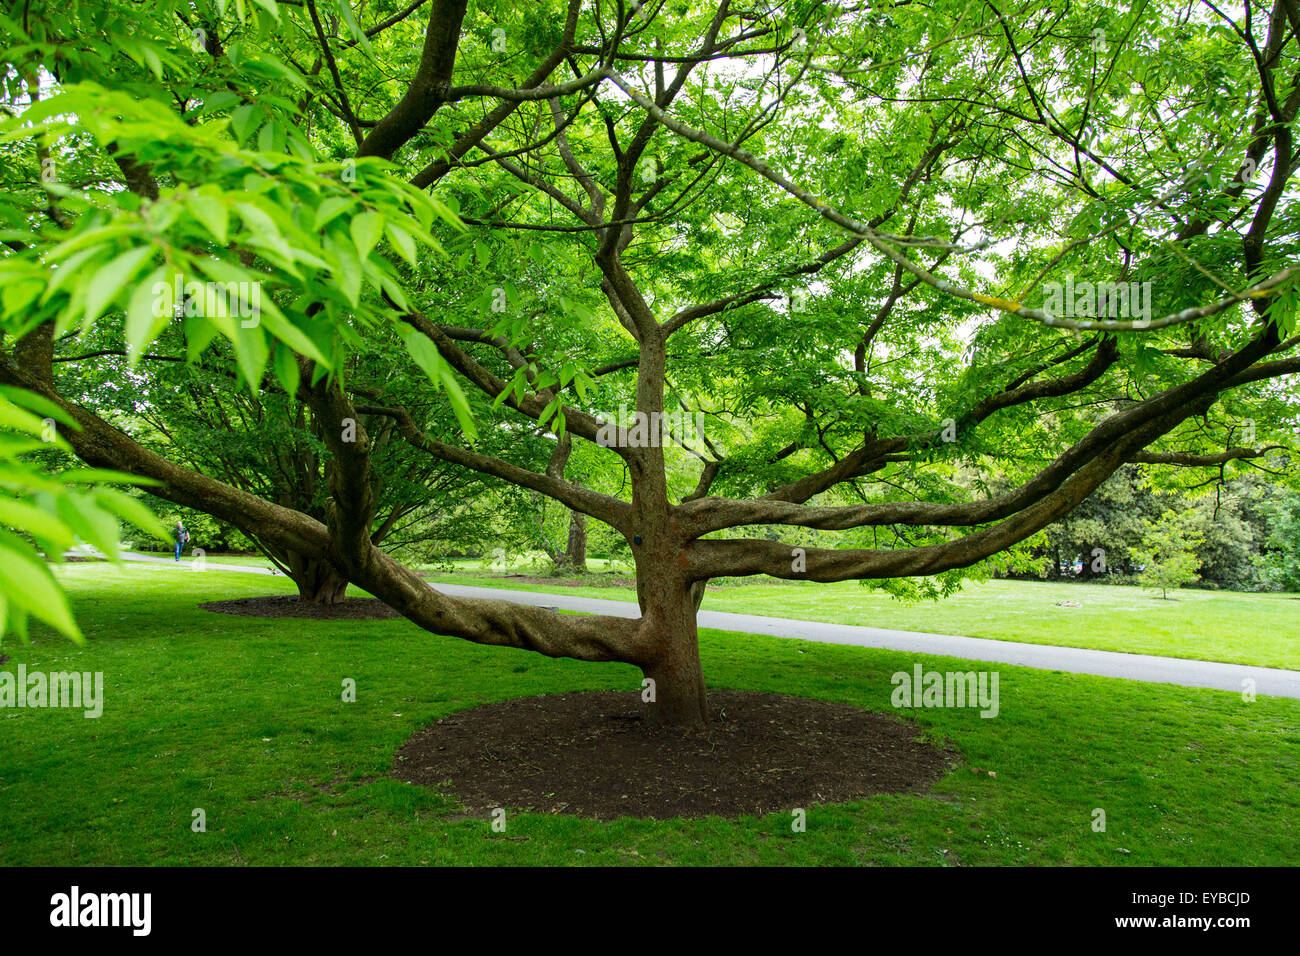 Kew Gardens Schneider's Zelkova tree - Stock Image